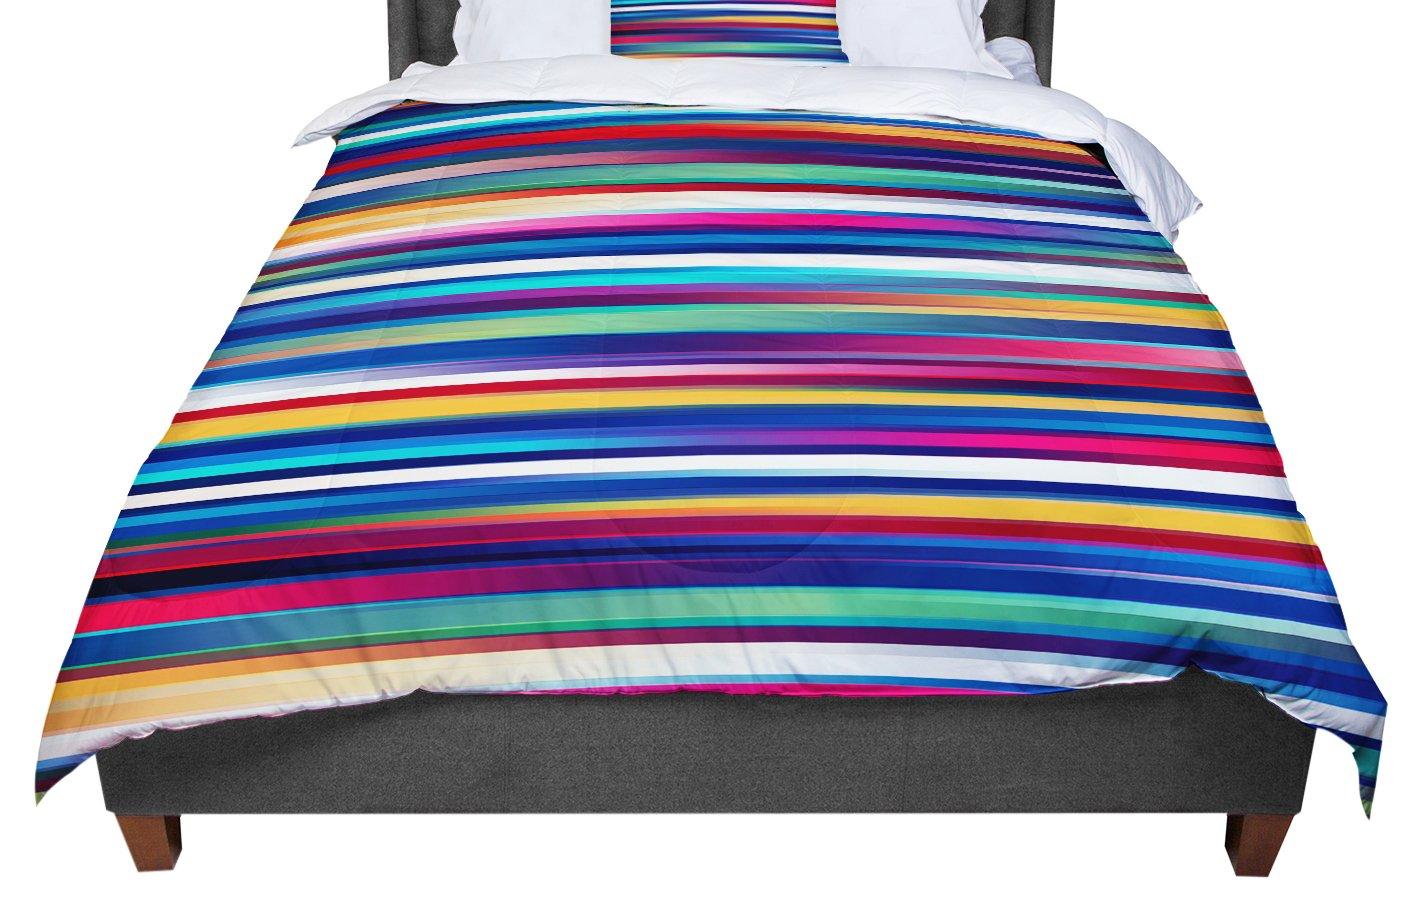 KESS InHouse Danny Ivan 'Blurry Lines' Multicolor King / Cal King Comforter, 104' X 88'